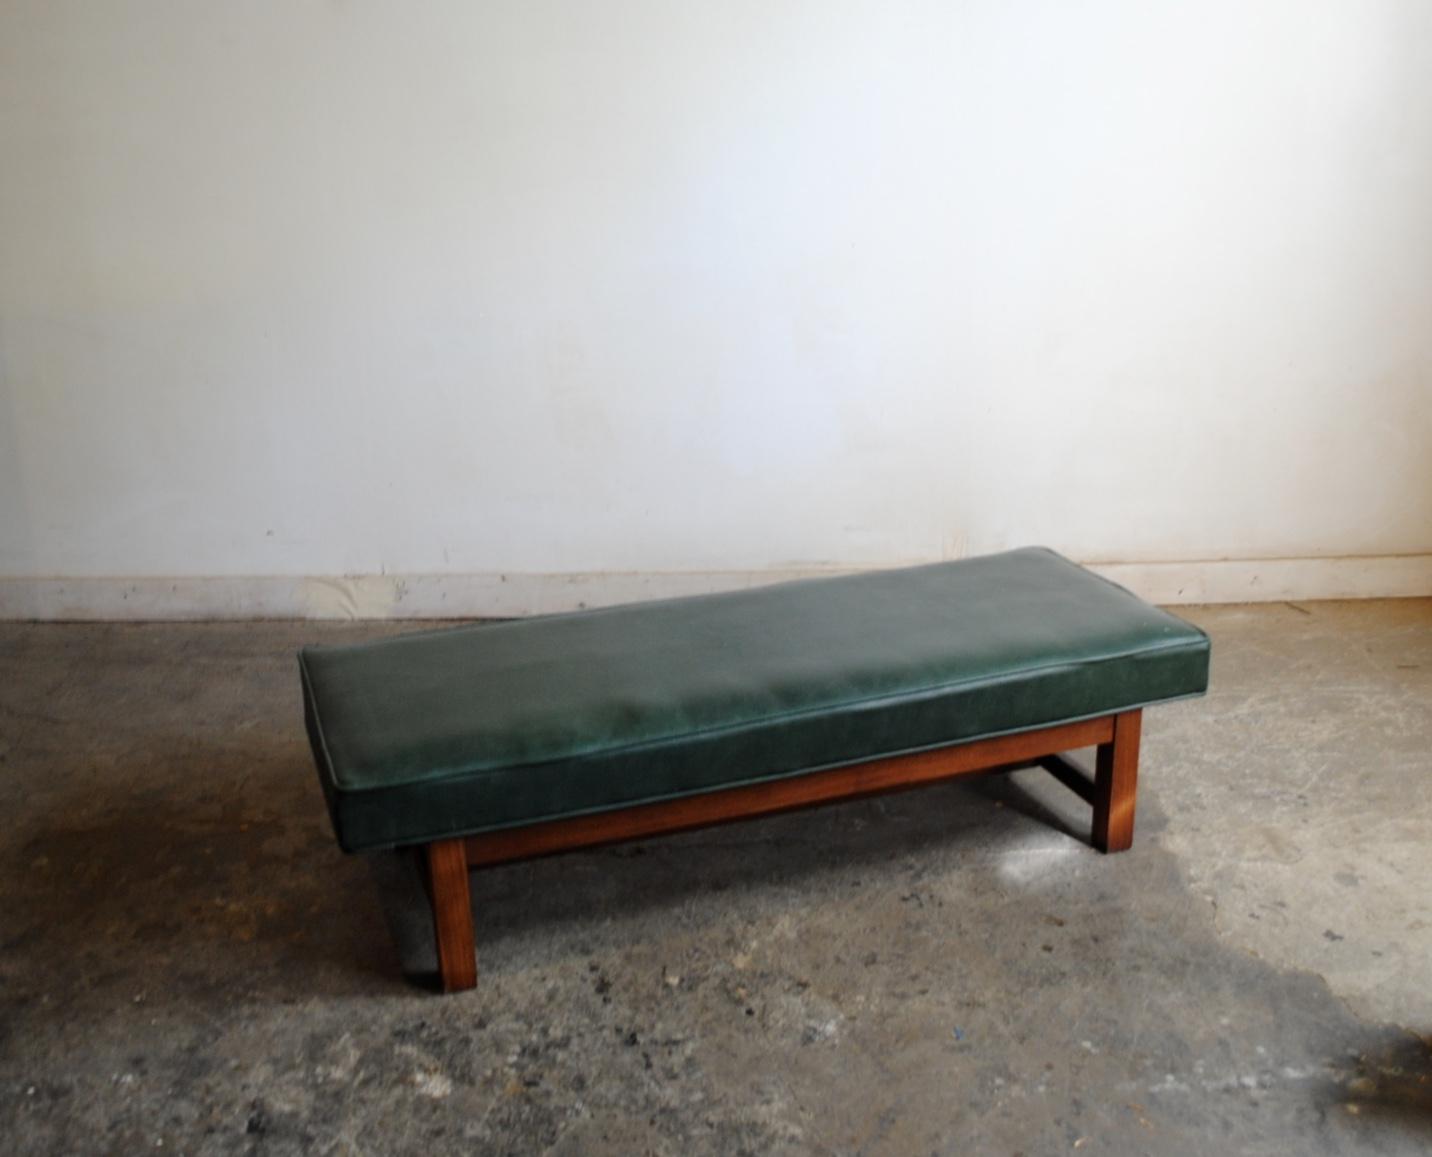 midcentury modern bench u2013 solid walnut base with dark green naugahyde cushion dimensions are 485u2033l x 185u2033w x 125u2033h please contact me with any